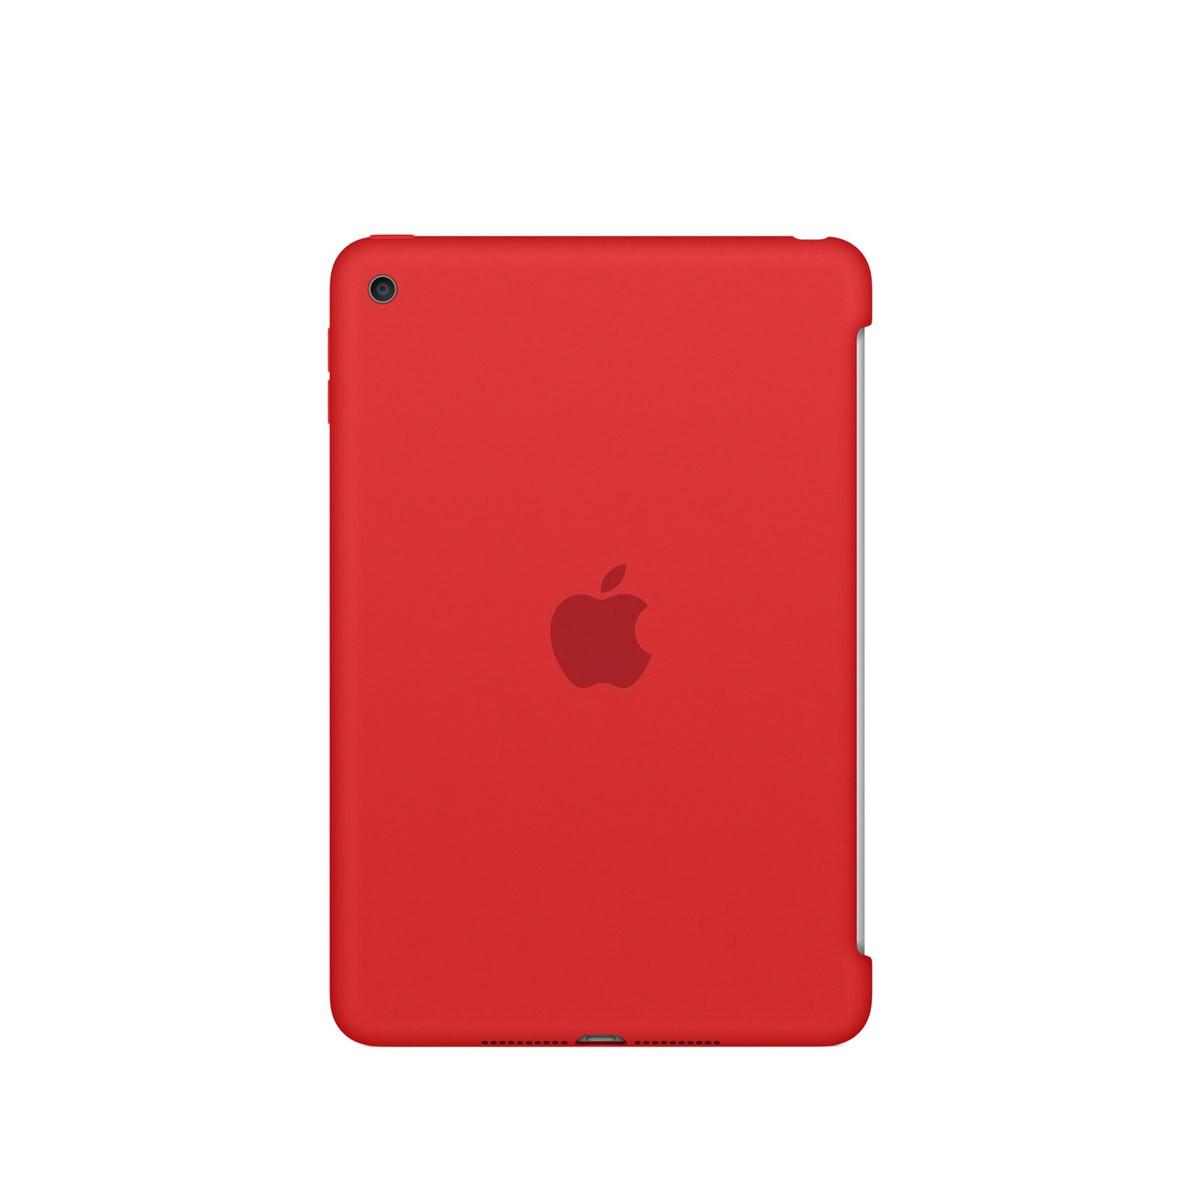 Apple Silikonové pouzdro na iPad mini 4 – (PRODUCT)RED mkln2zm/a